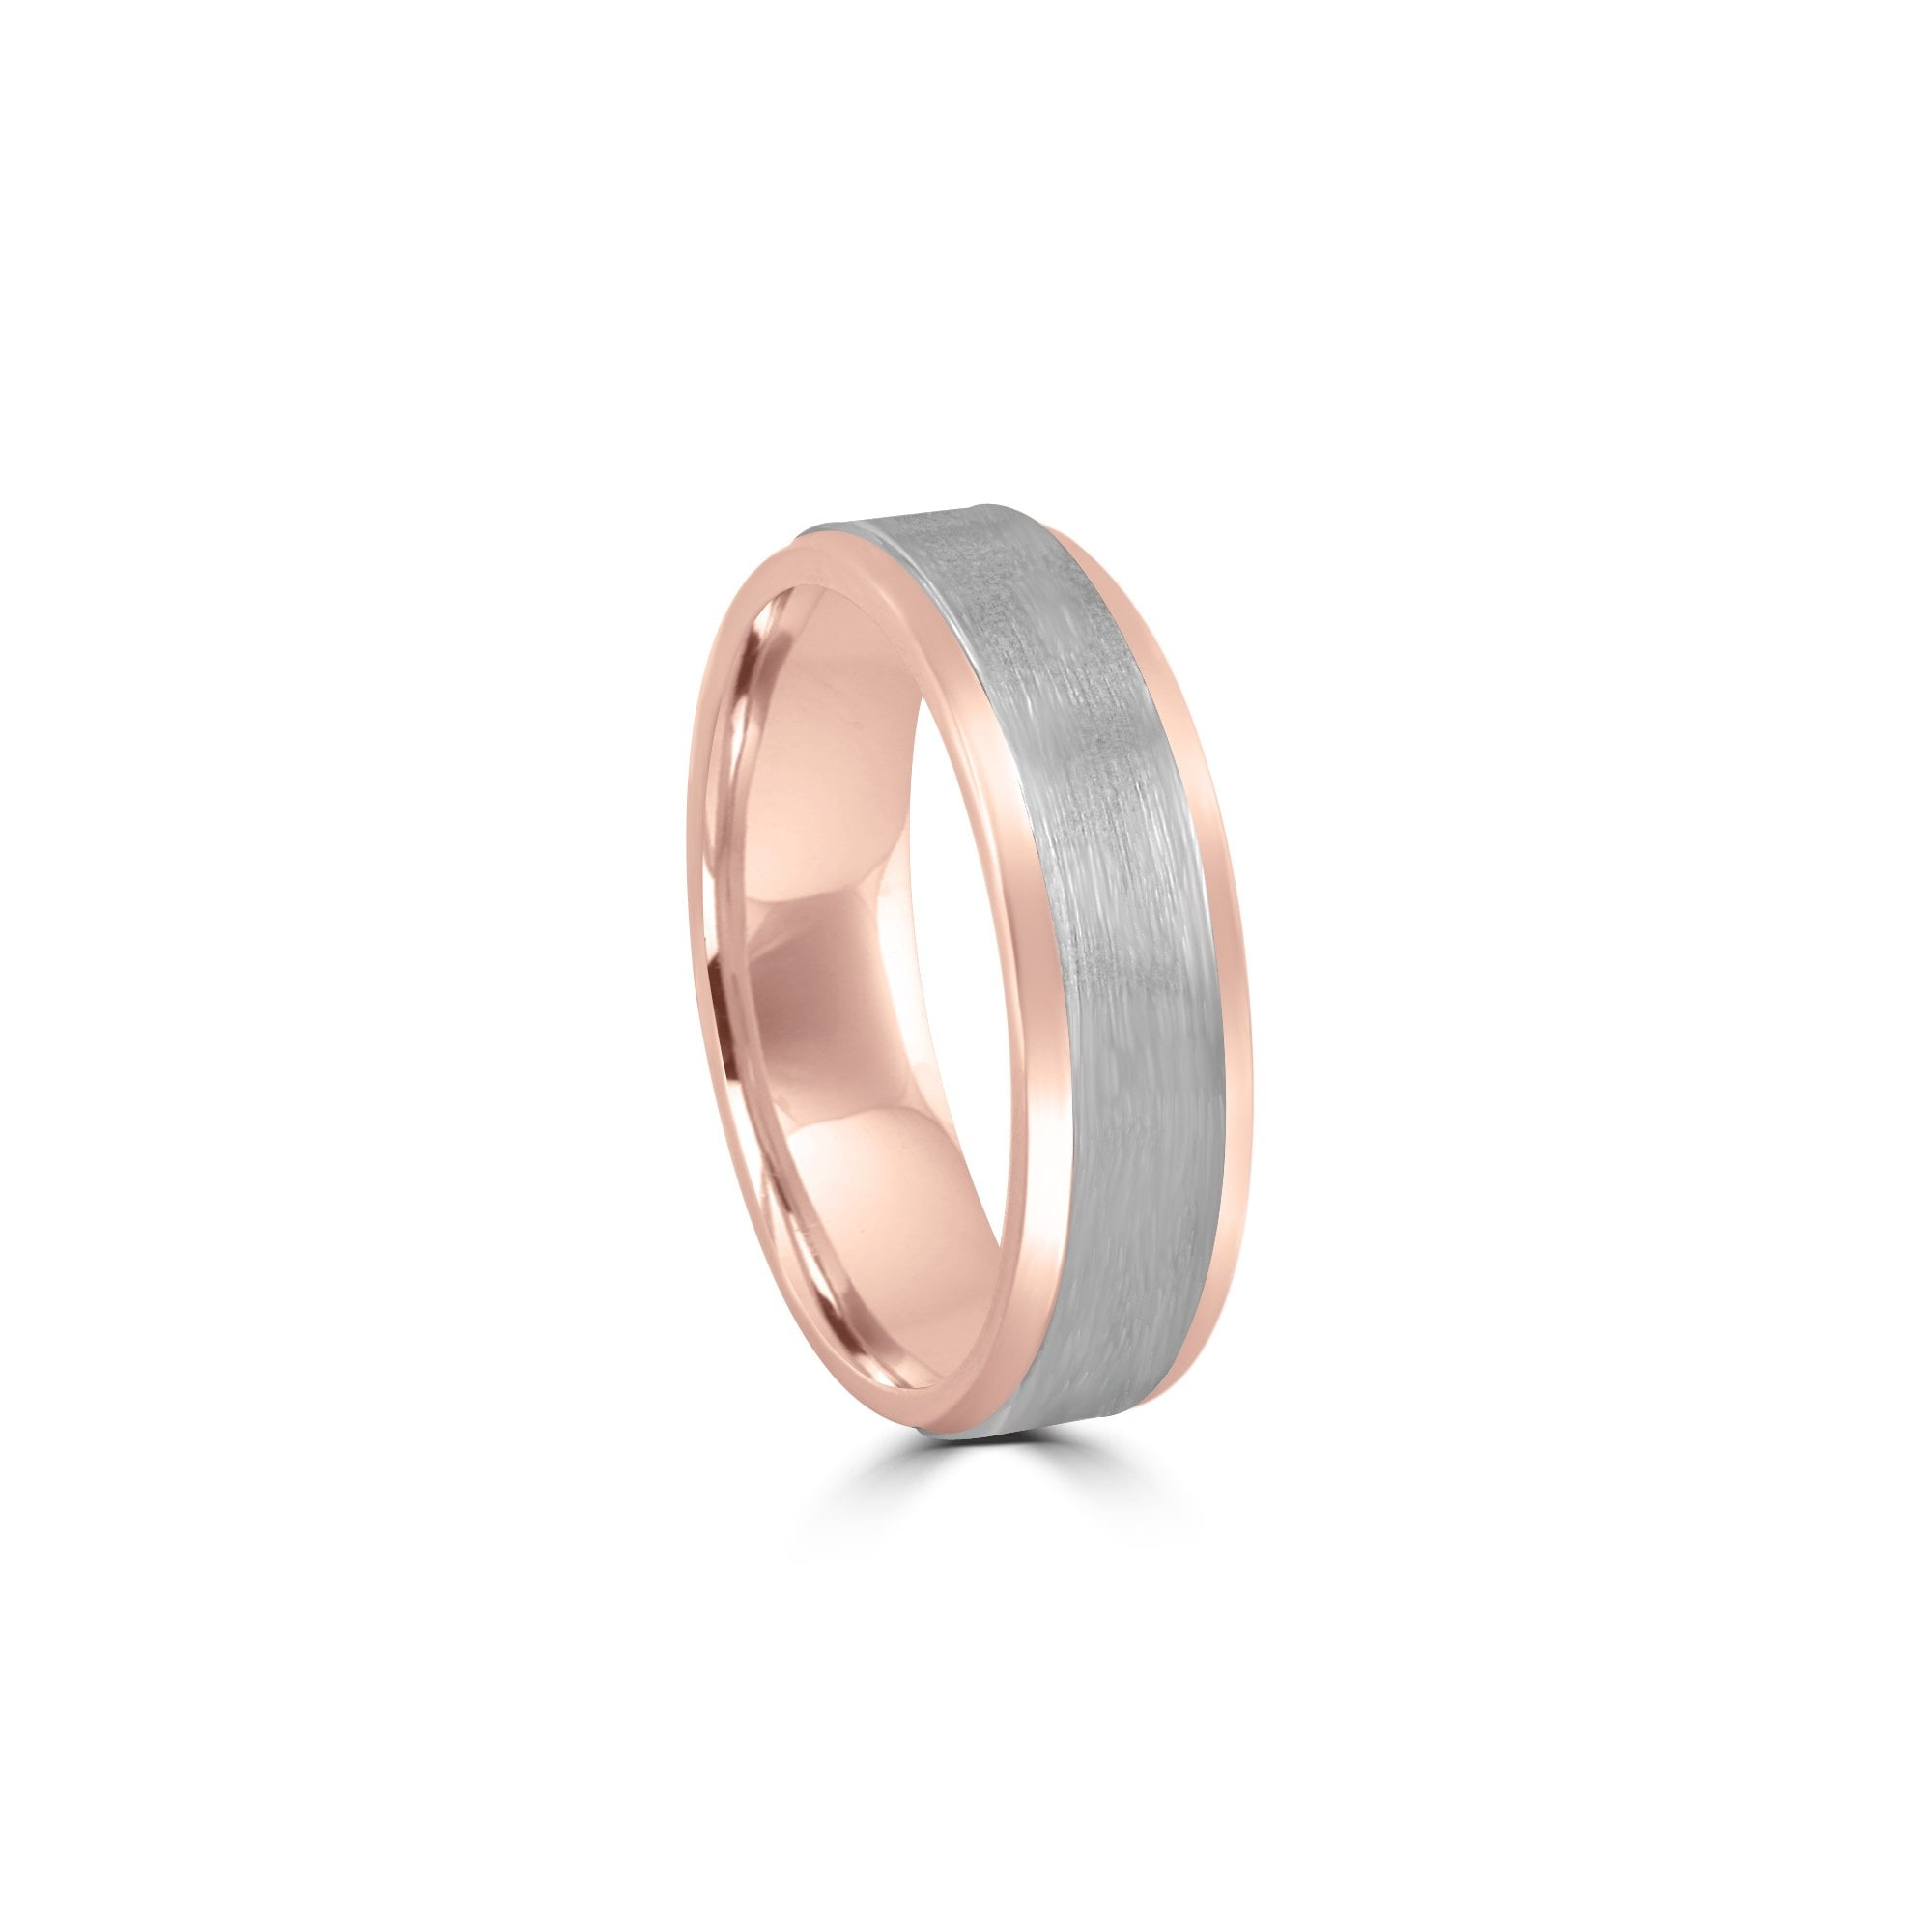 Platinum Wedding Rings.18ct Rose Gold And Platinum 6mm Wedding Ring